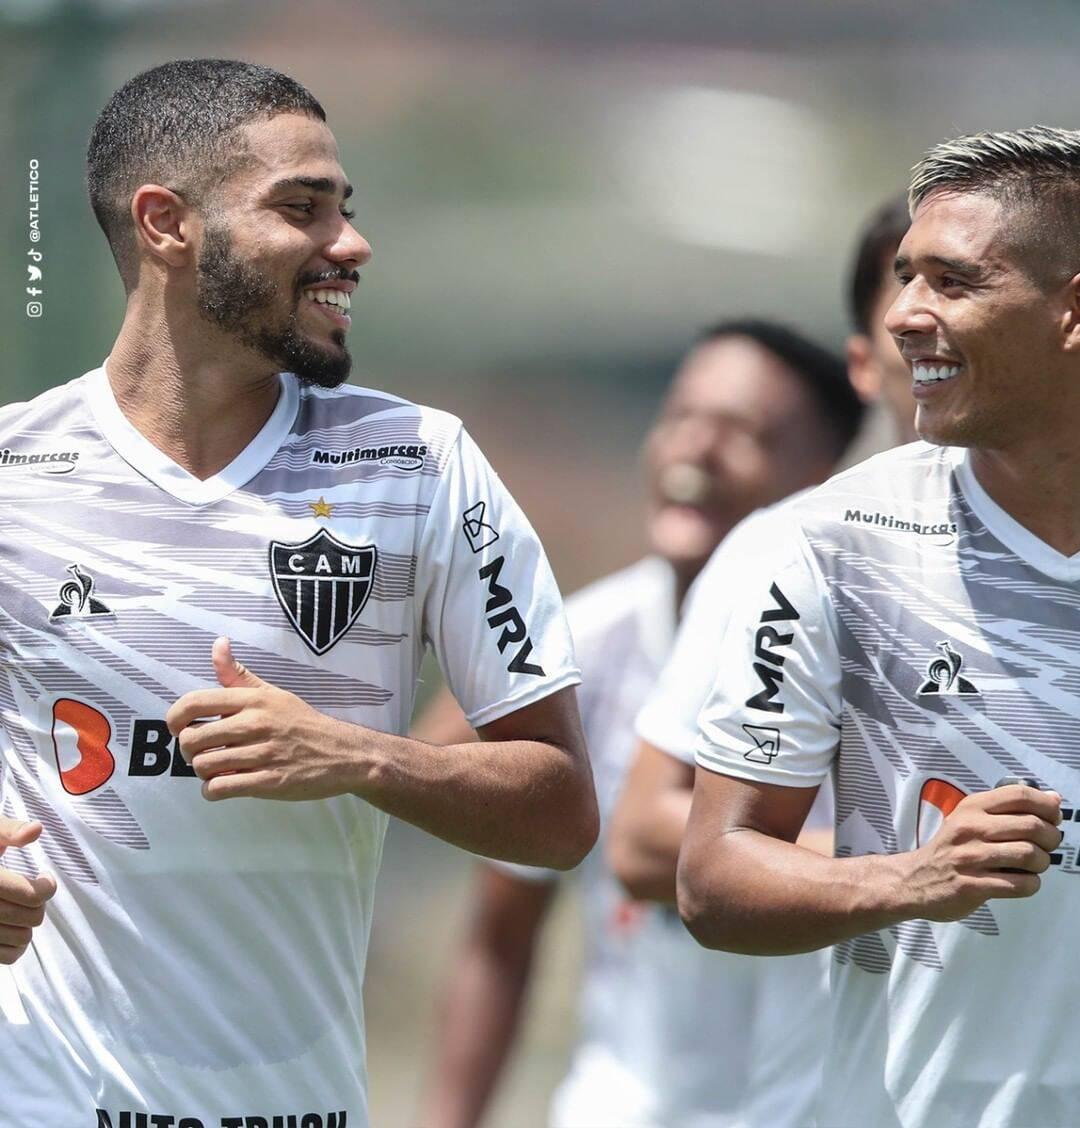 Foto: Instagram/Atlético-MG